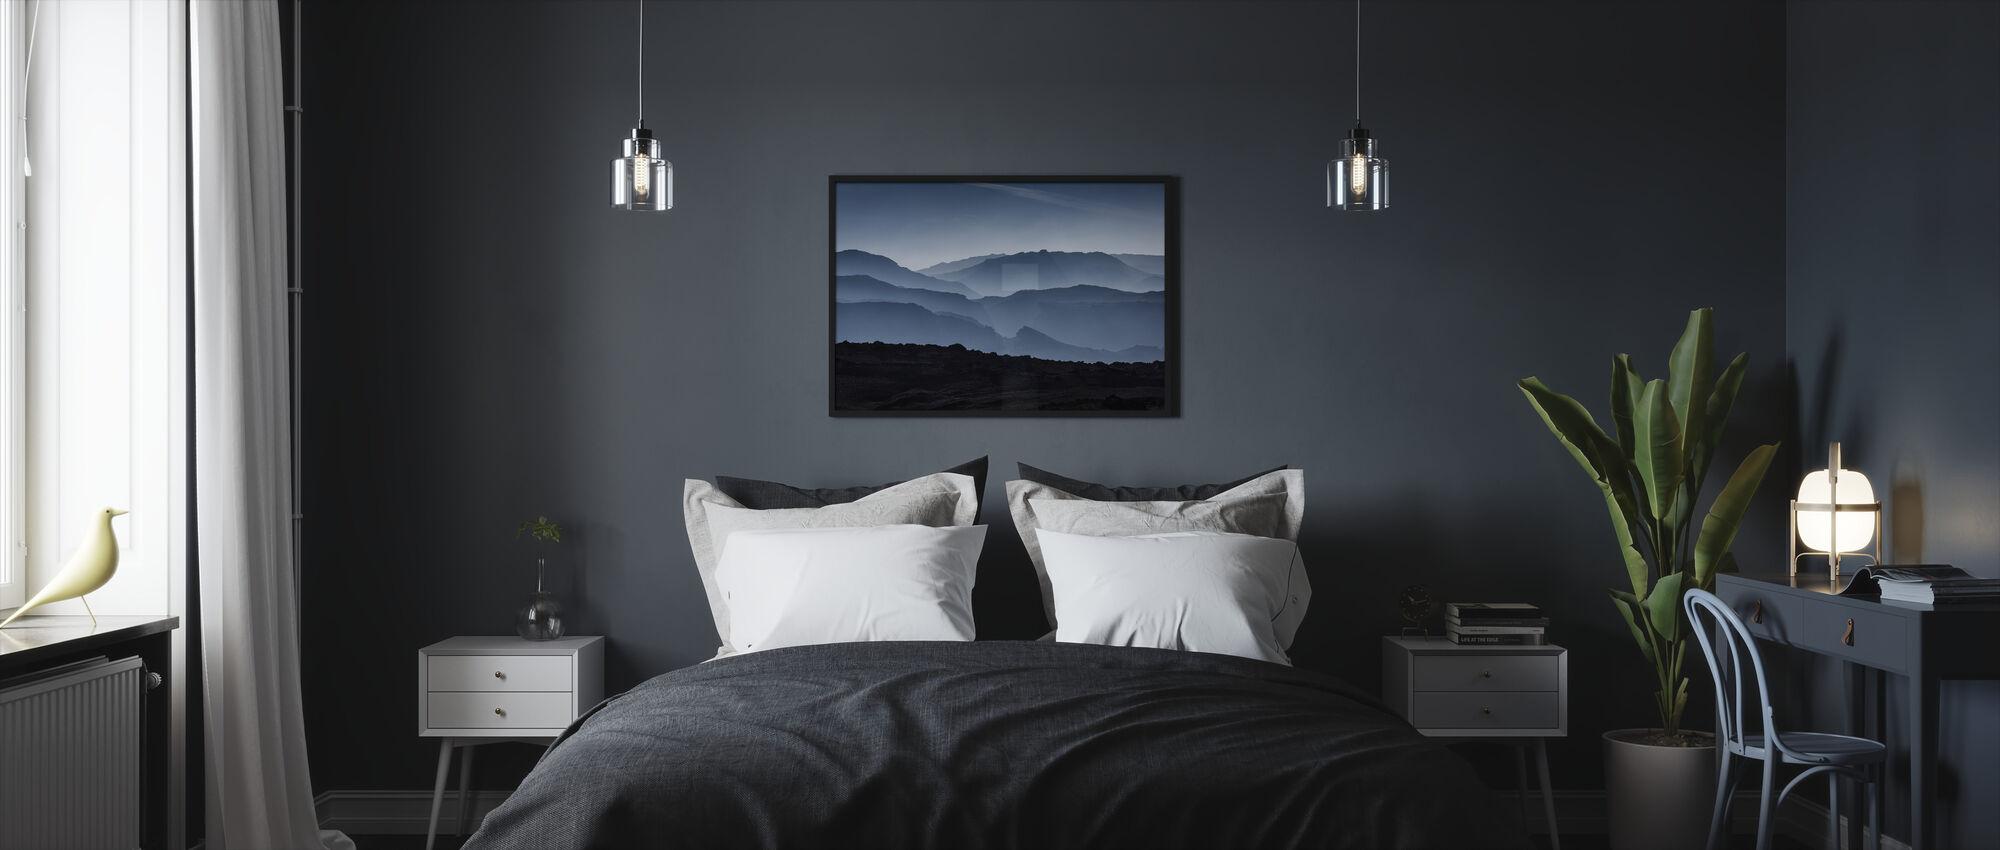 Icelandic Mountains - Framed print - Bedroom